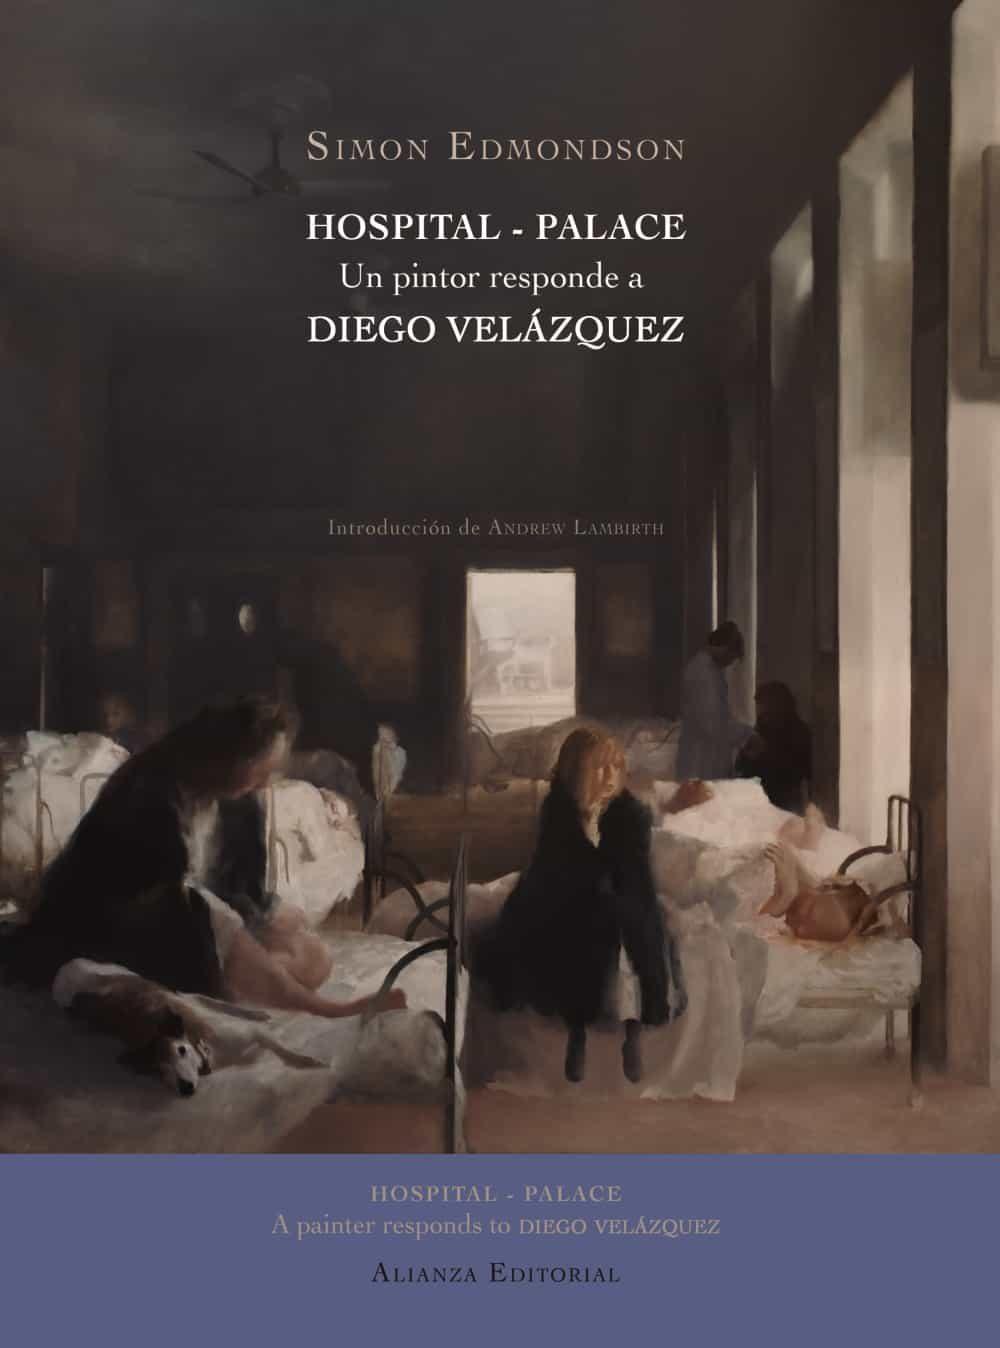 hospital - palace-simon edmondson-9788420676302